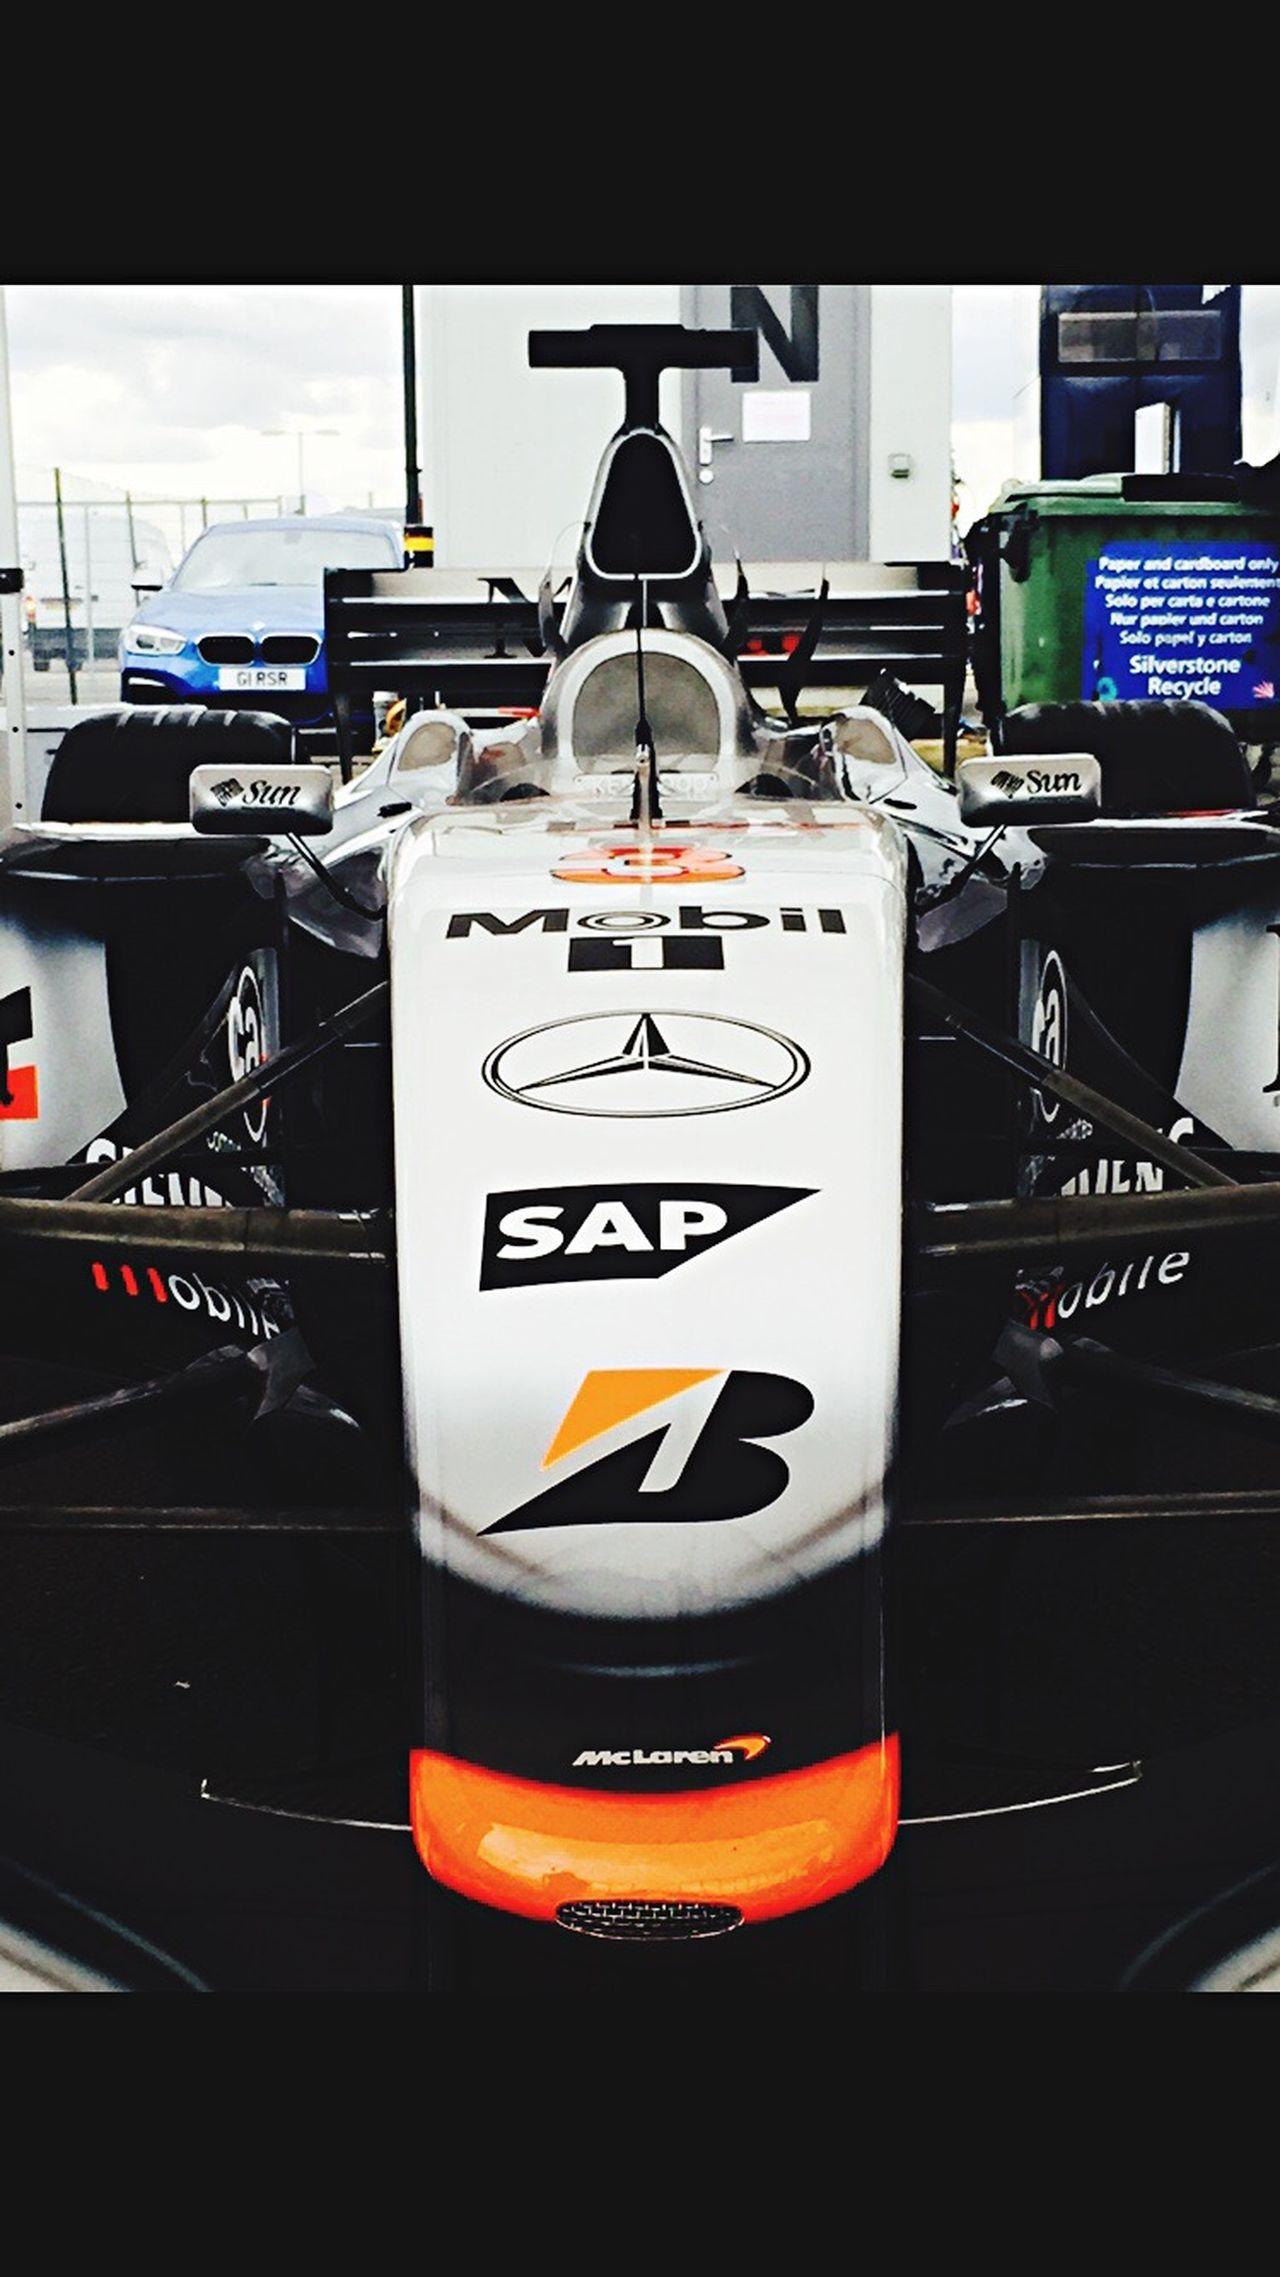 McLaren MP4-14a (null)F1 FormulaoneMika Hakkinen (null)Sexygirl Beast V10 19000rpm Silver Orange Color 3 (null)Mercedes EyeEm Best Shots Eye4photography  EyeEm Gallery PhotoByMe